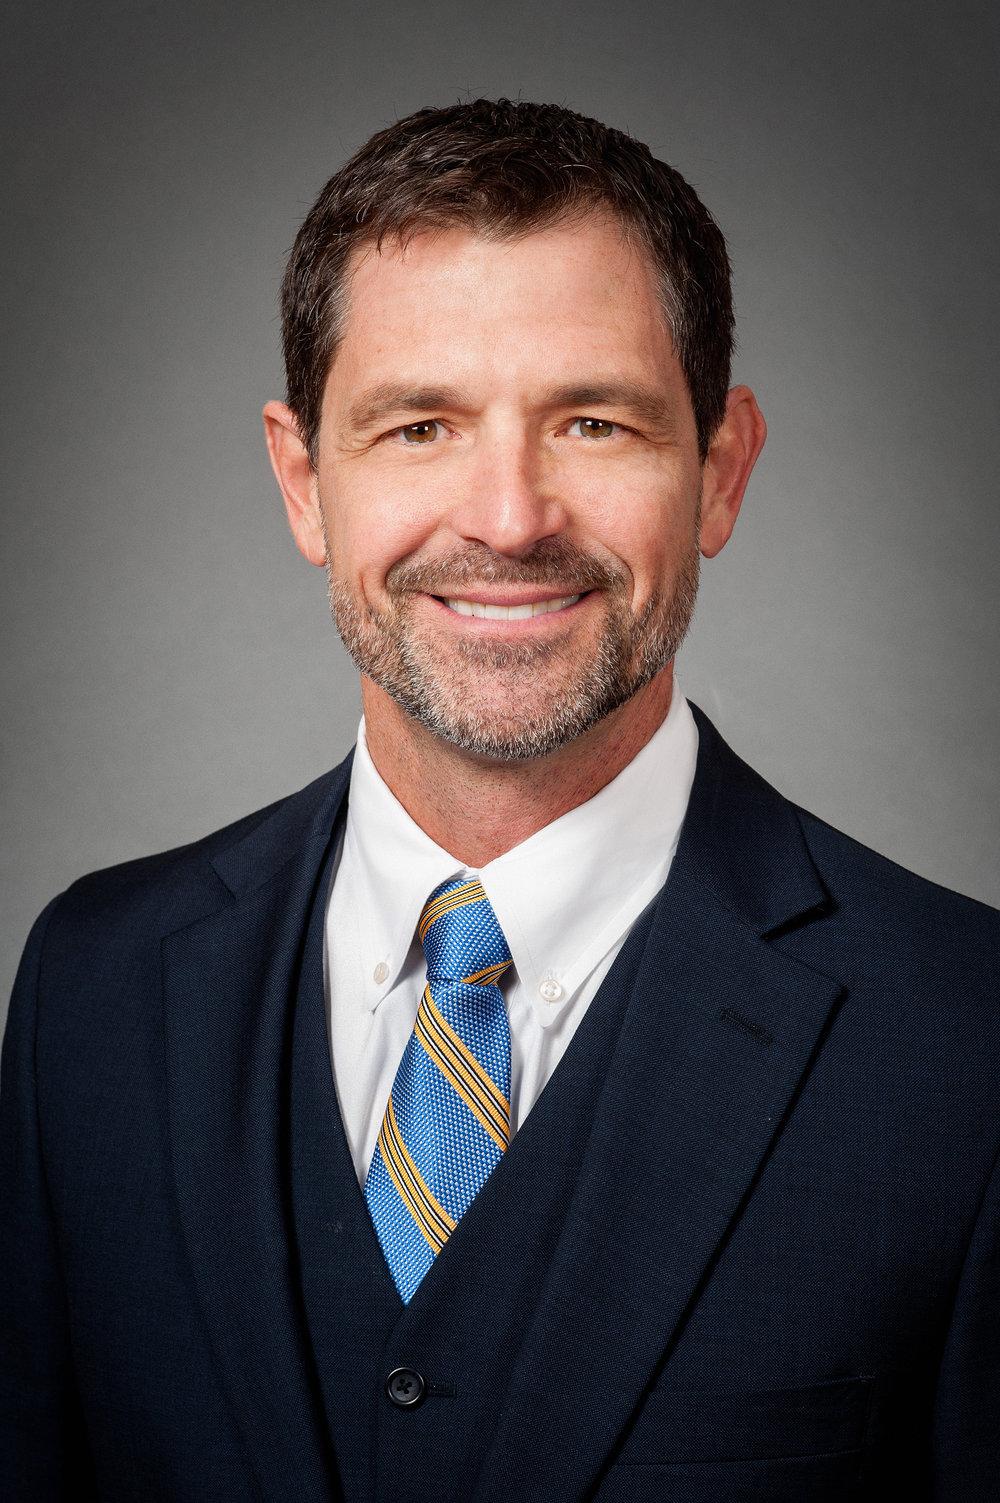 Phillip Hayes, MBA, CVA - Managing Partner